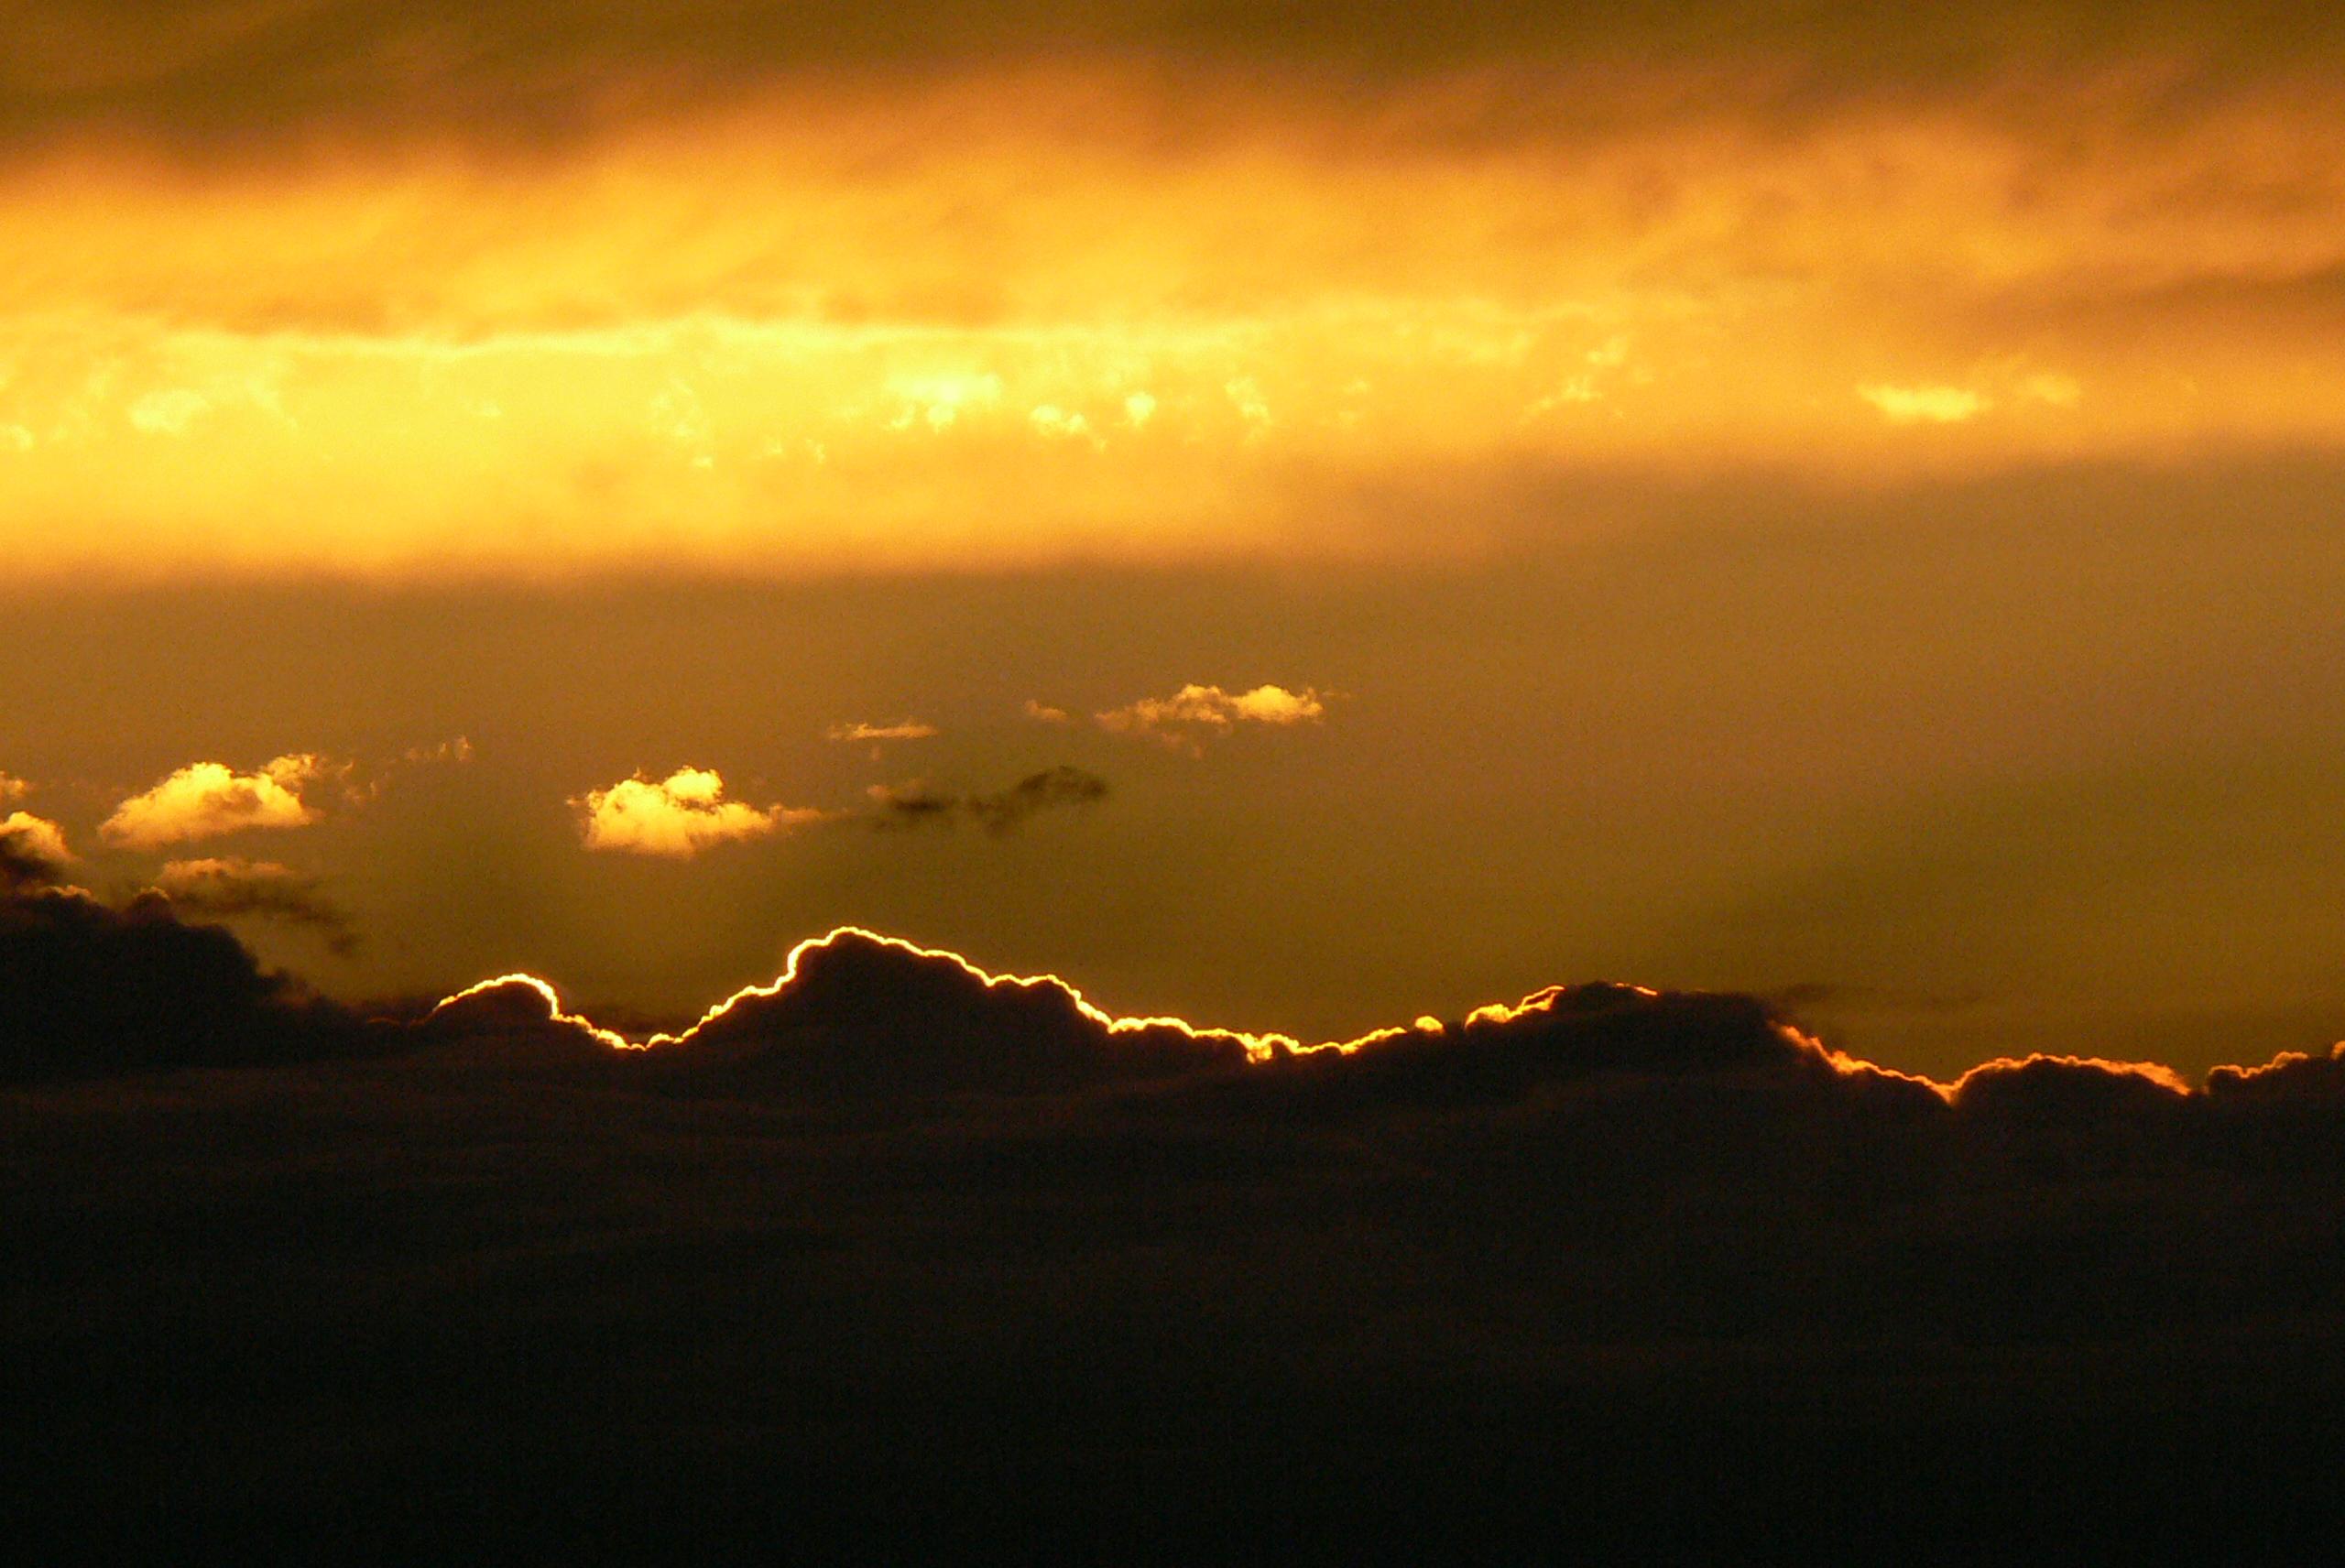 curiosity sunrise sunset times - HD2560×1712